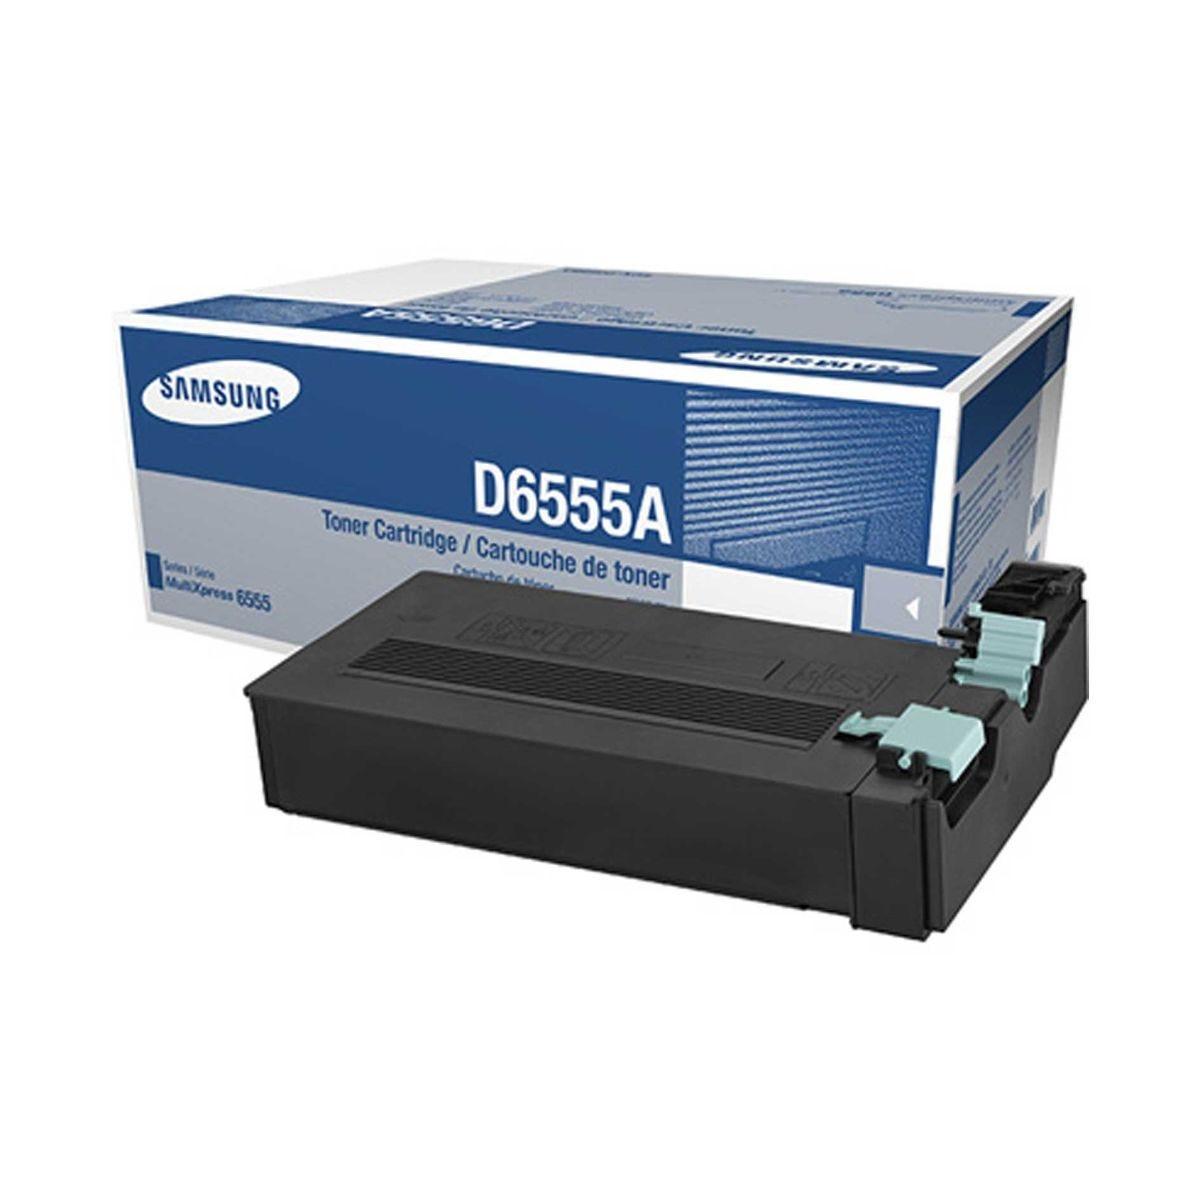 Image of Samsung SCX-D6555A Printer Ink Toner Cartridge, Black